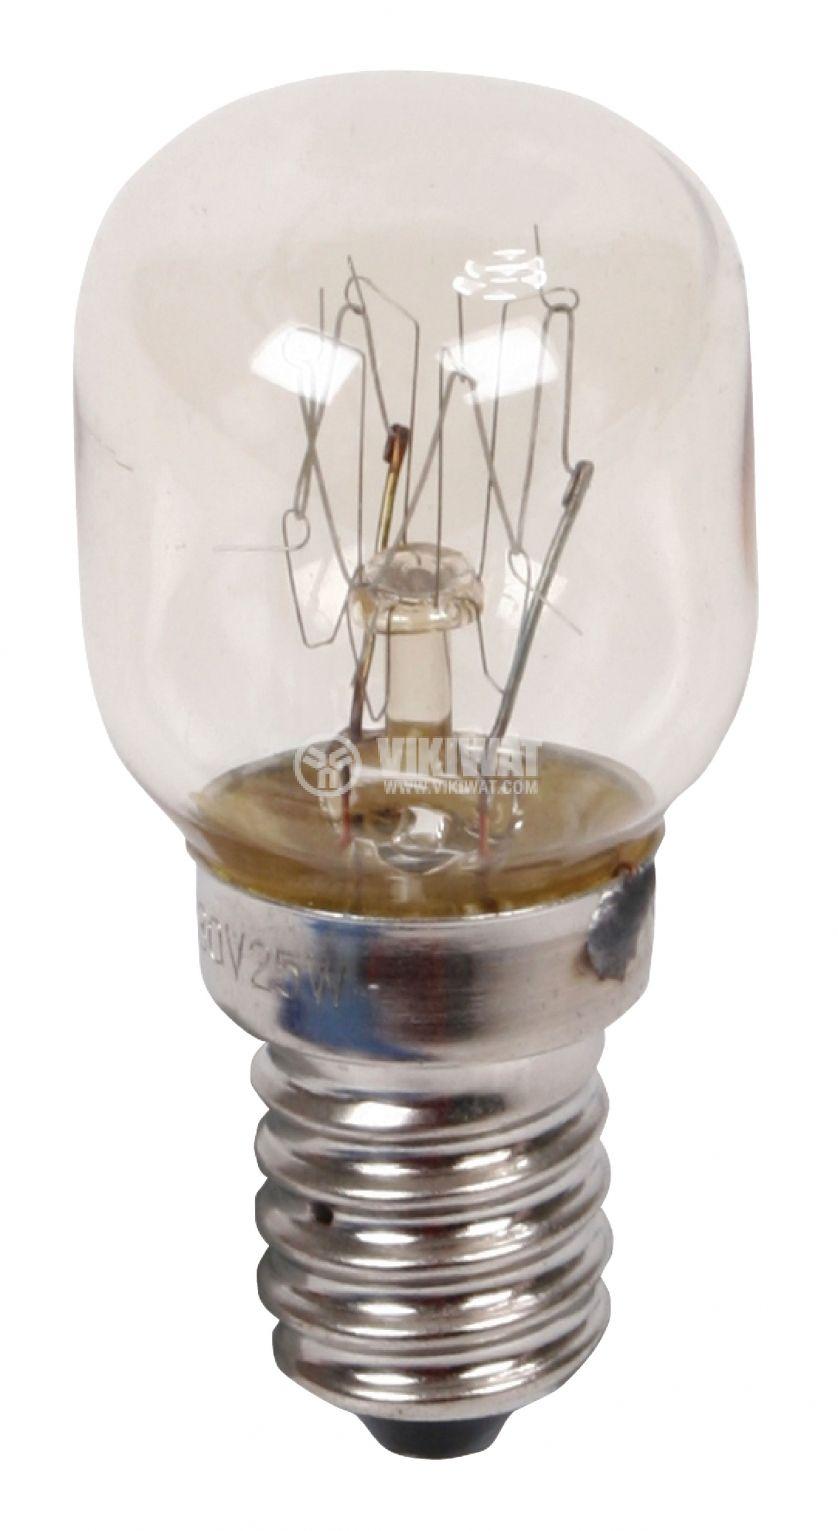 Lamp LAMP R08HQN 220V 25W E14 for refrigerator